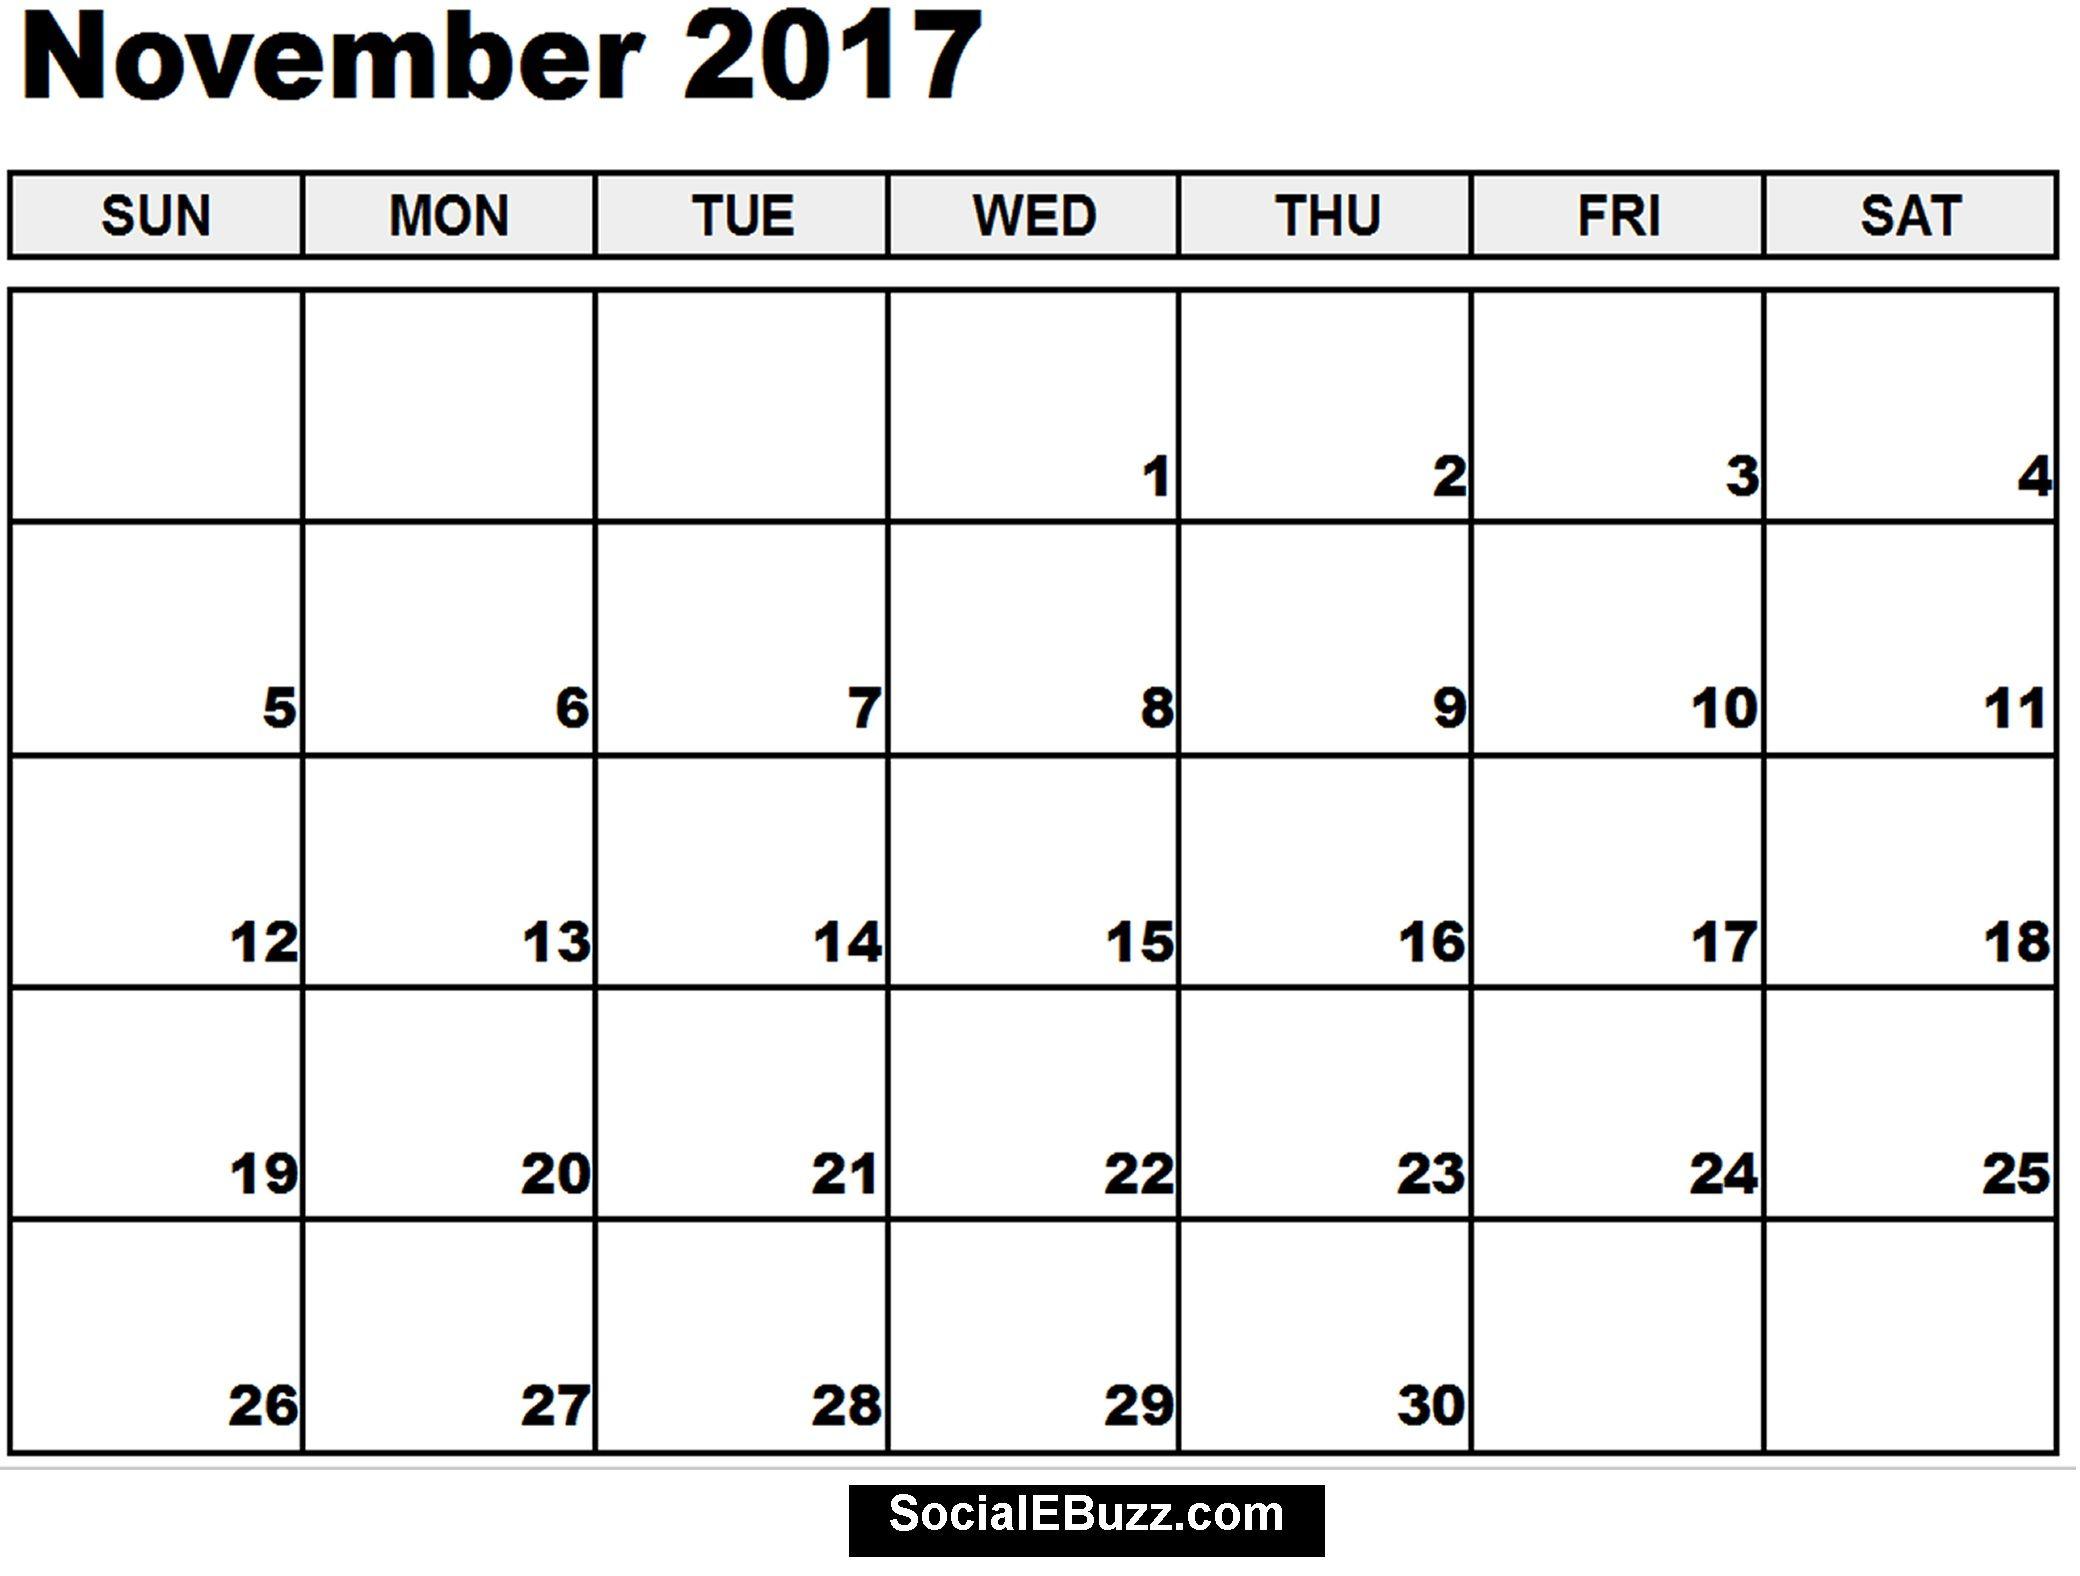 2017 November Calendar Printable http://socialebuzz.com/november ...